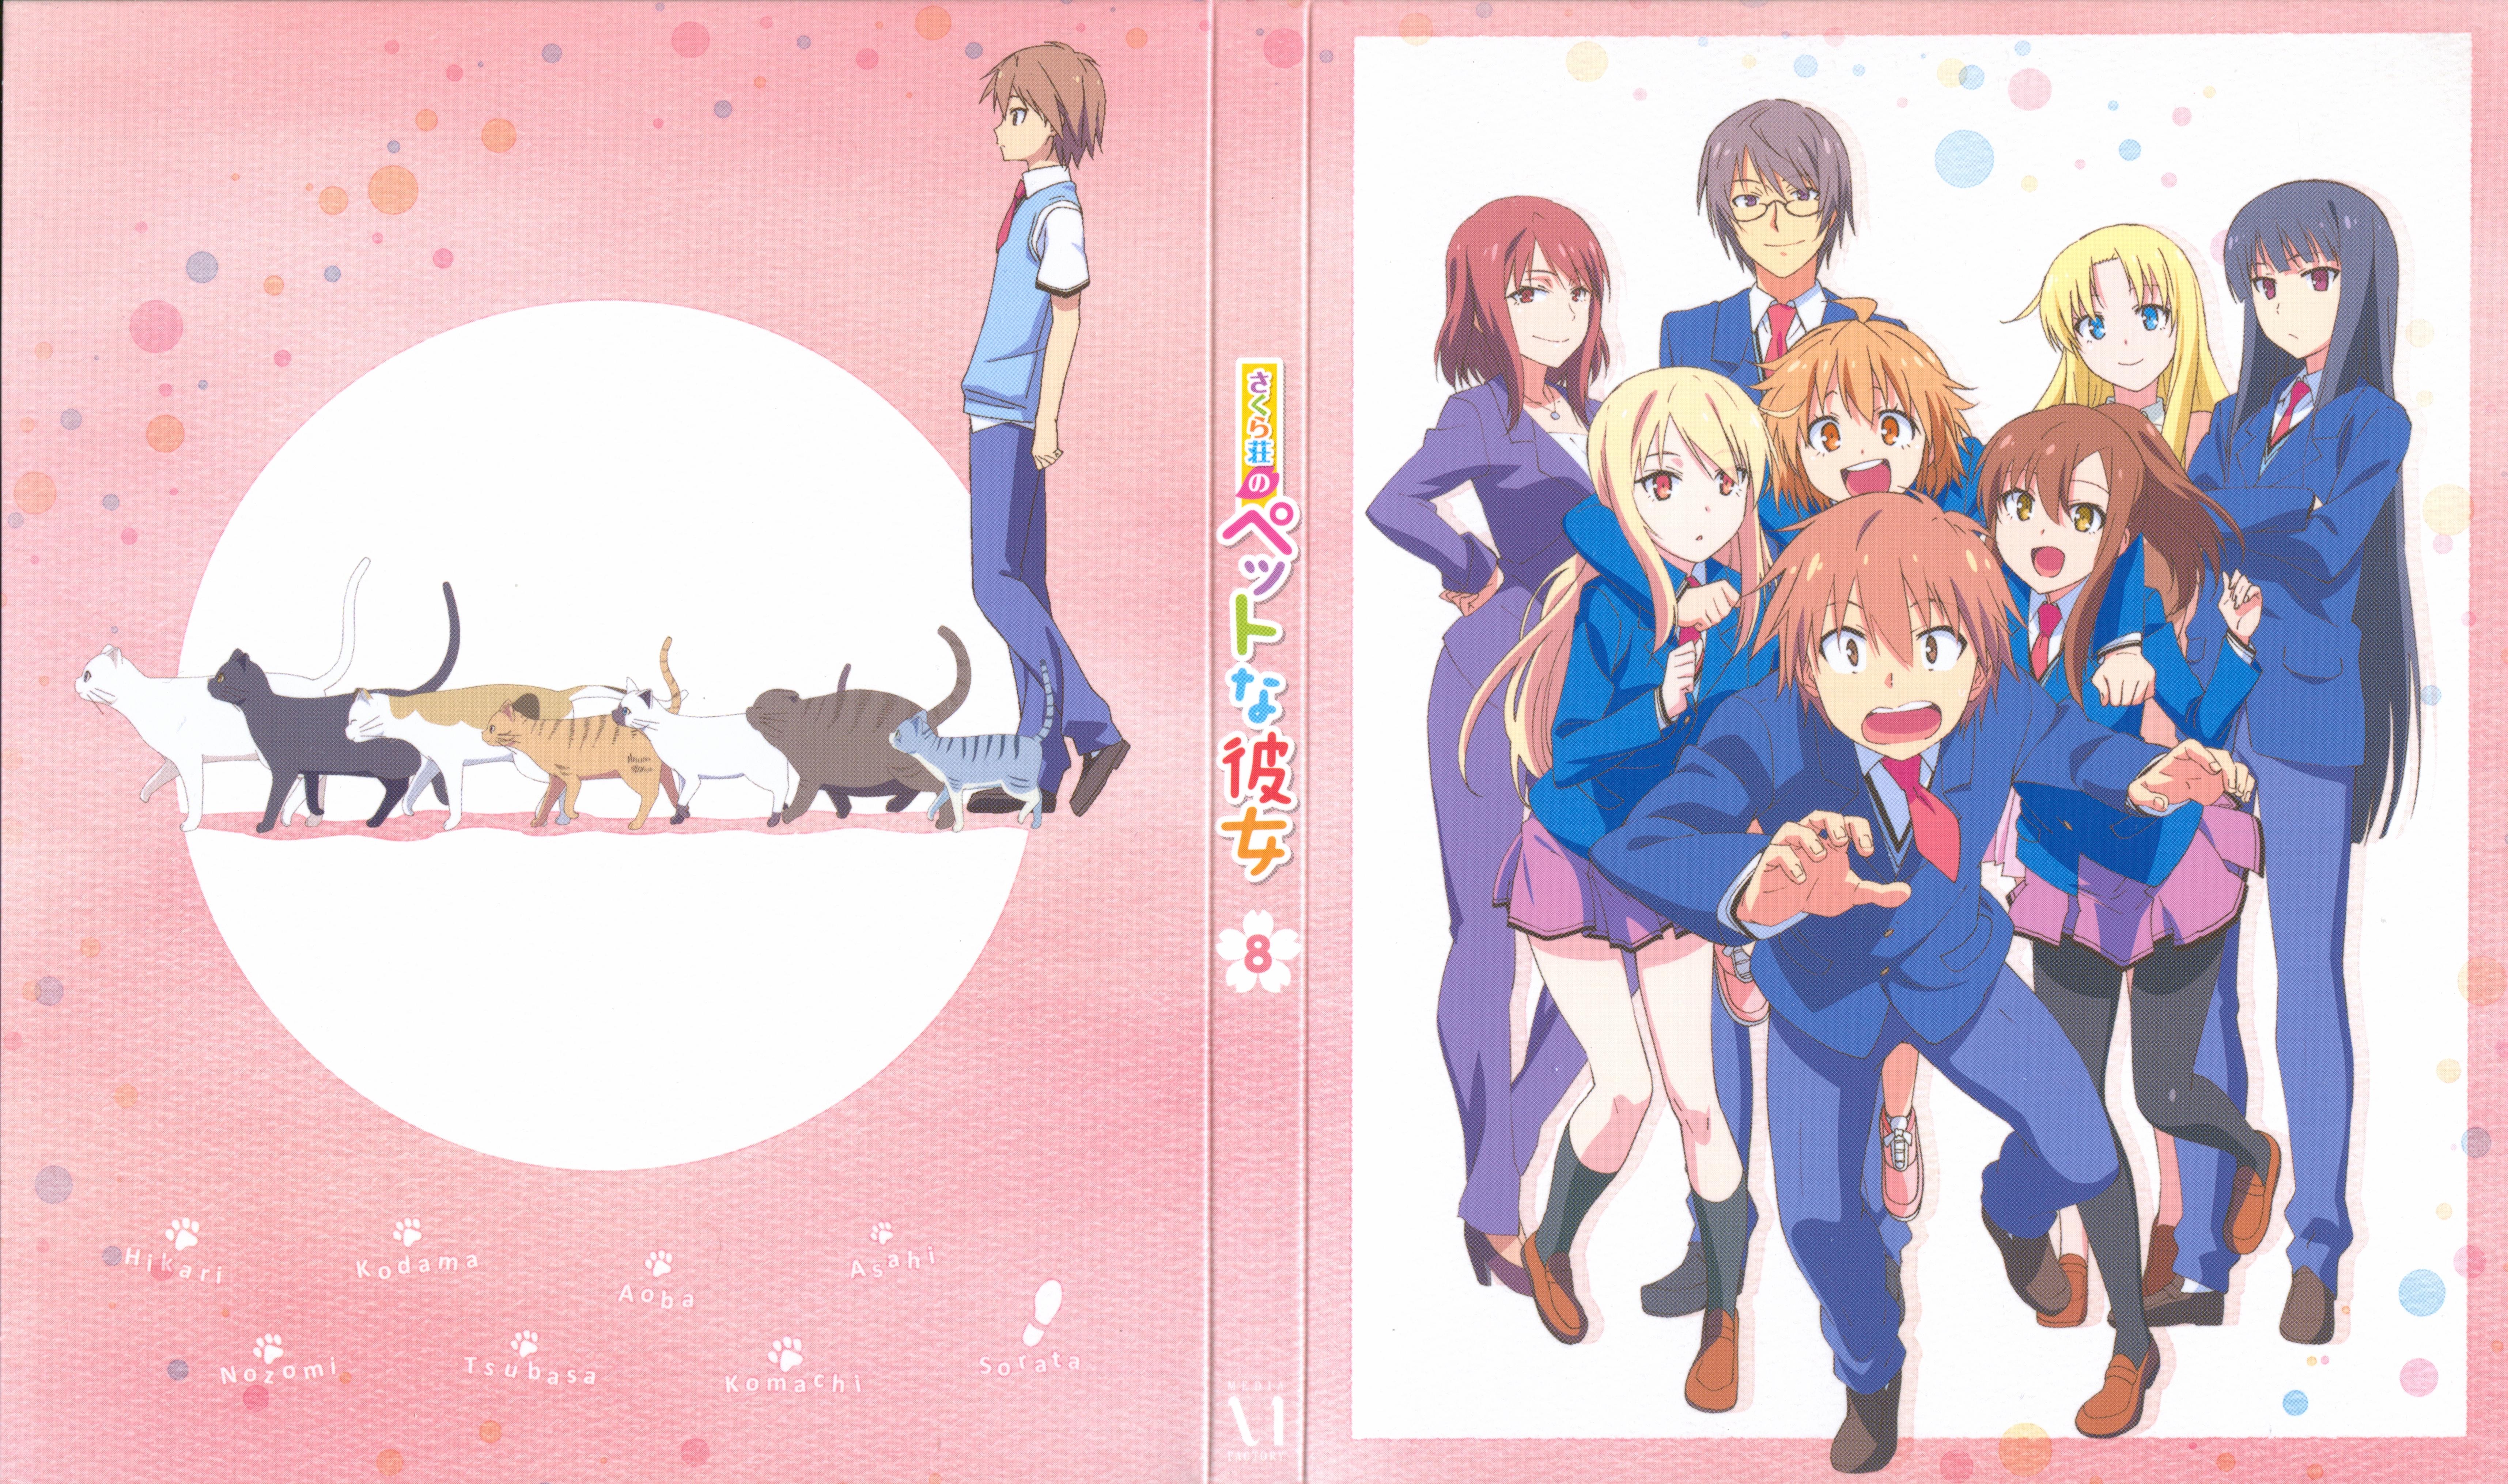 Sakurasou No Pet Na Kanojo Wallpaper 1617974 Zerochan Anime Image Board